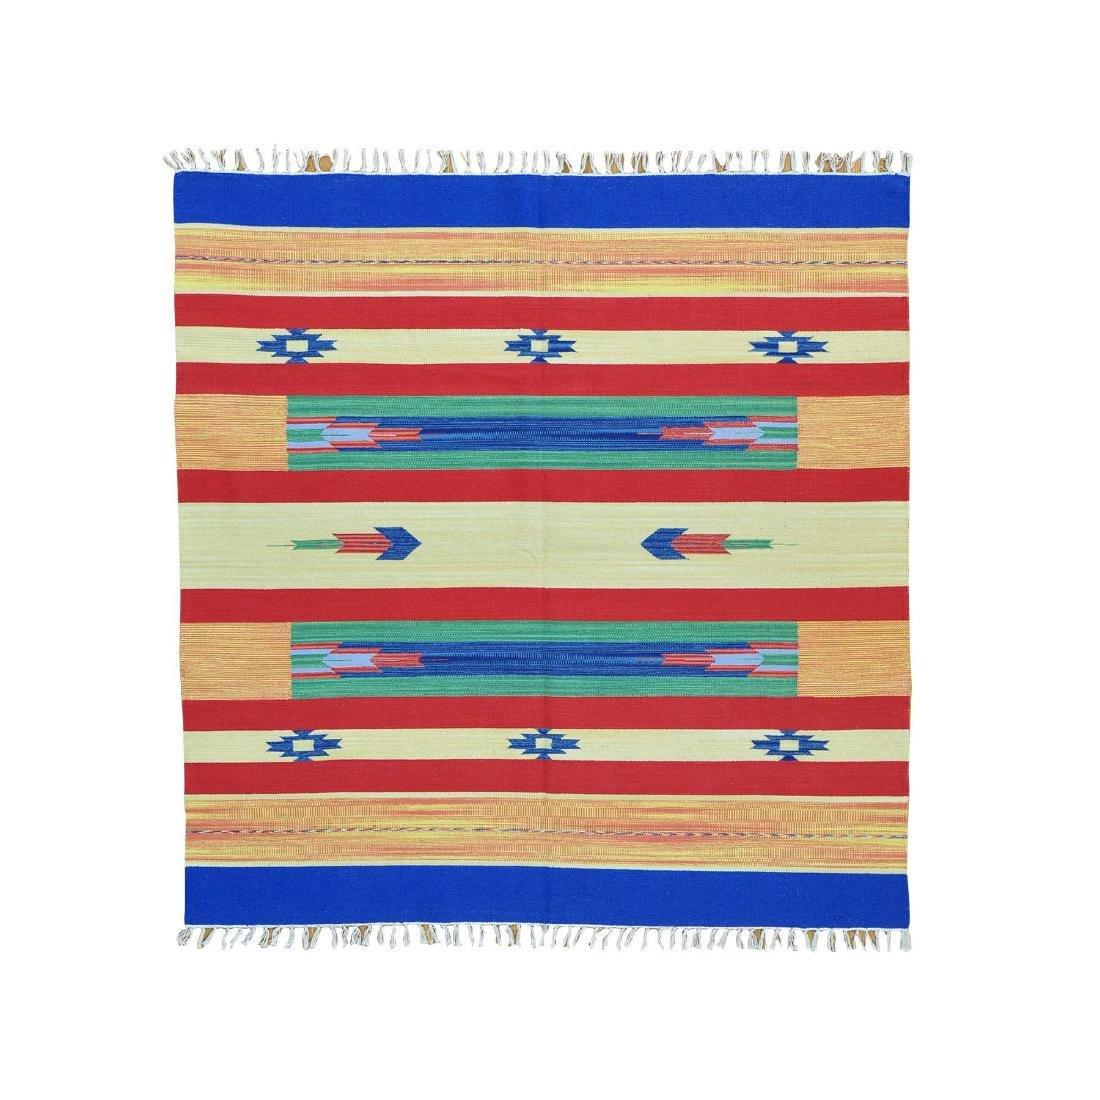 Flat Weave Kilim Hand Woven Navajo Design Rug 6x6.1